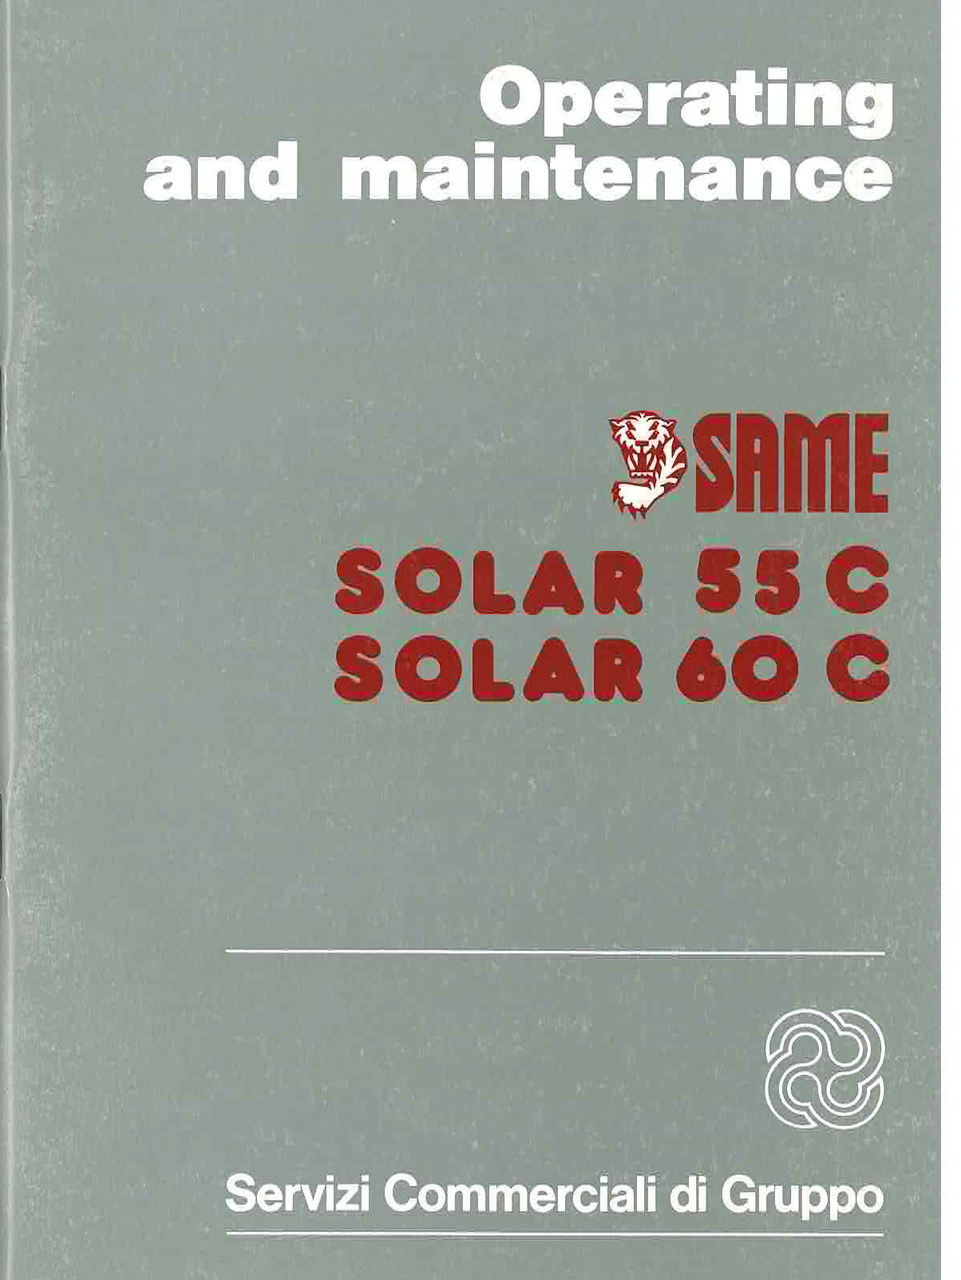 SOLAR 55 C - 60 C - Operating and maintenance